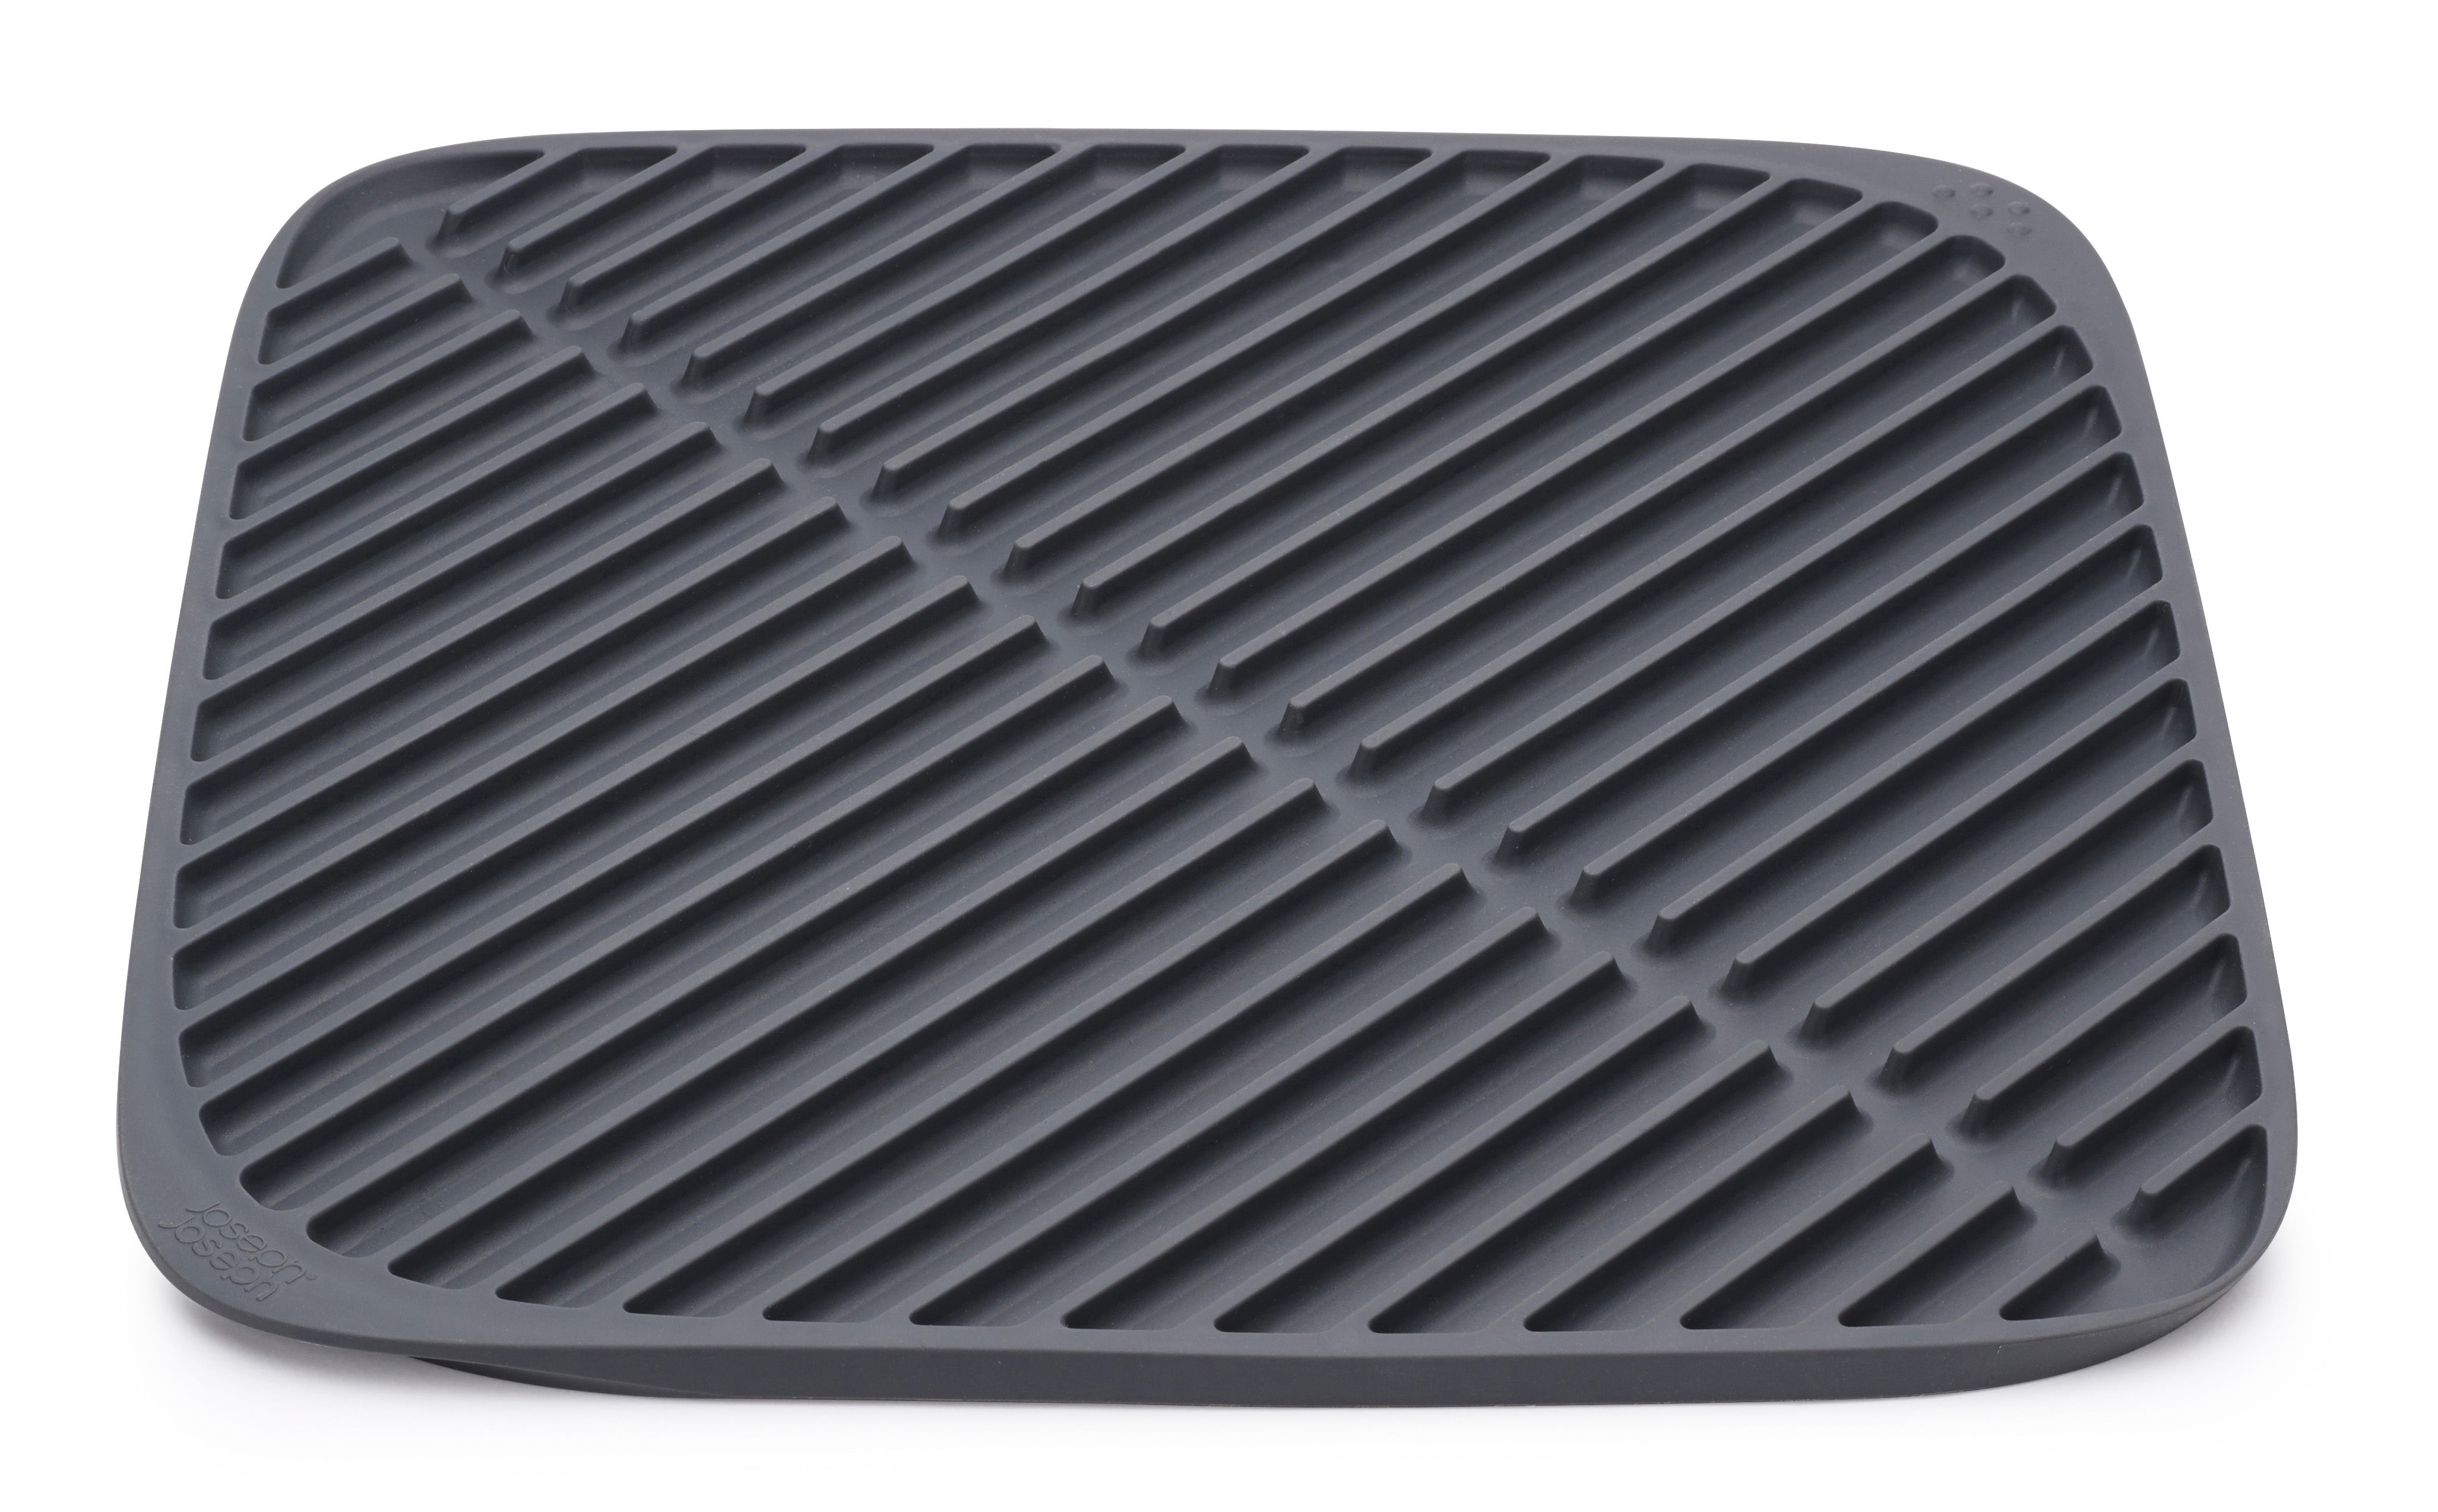 Kitchenware - Kitchen Sink Accessories - Flume Draining mat - Strainer - New version by Joseph Joseph - Grey - Flexible silicone, Rubber